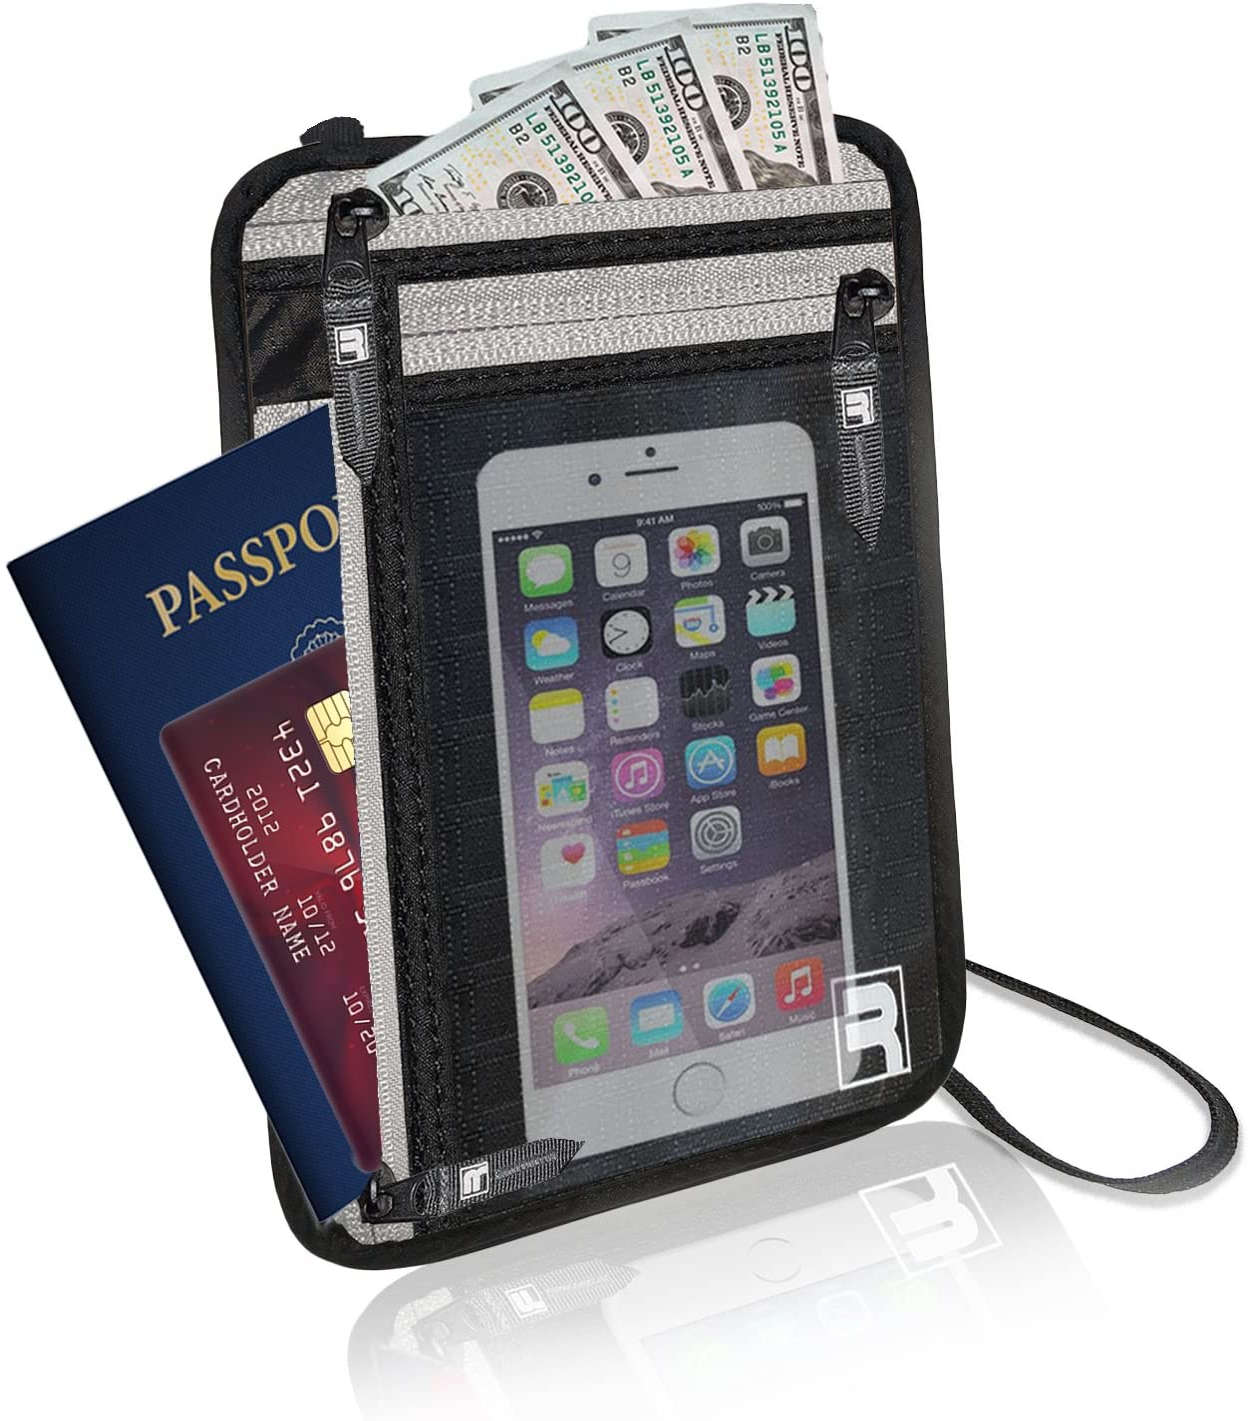 Cartera para Cuello con protección RFID. Porta pasaportes para ...